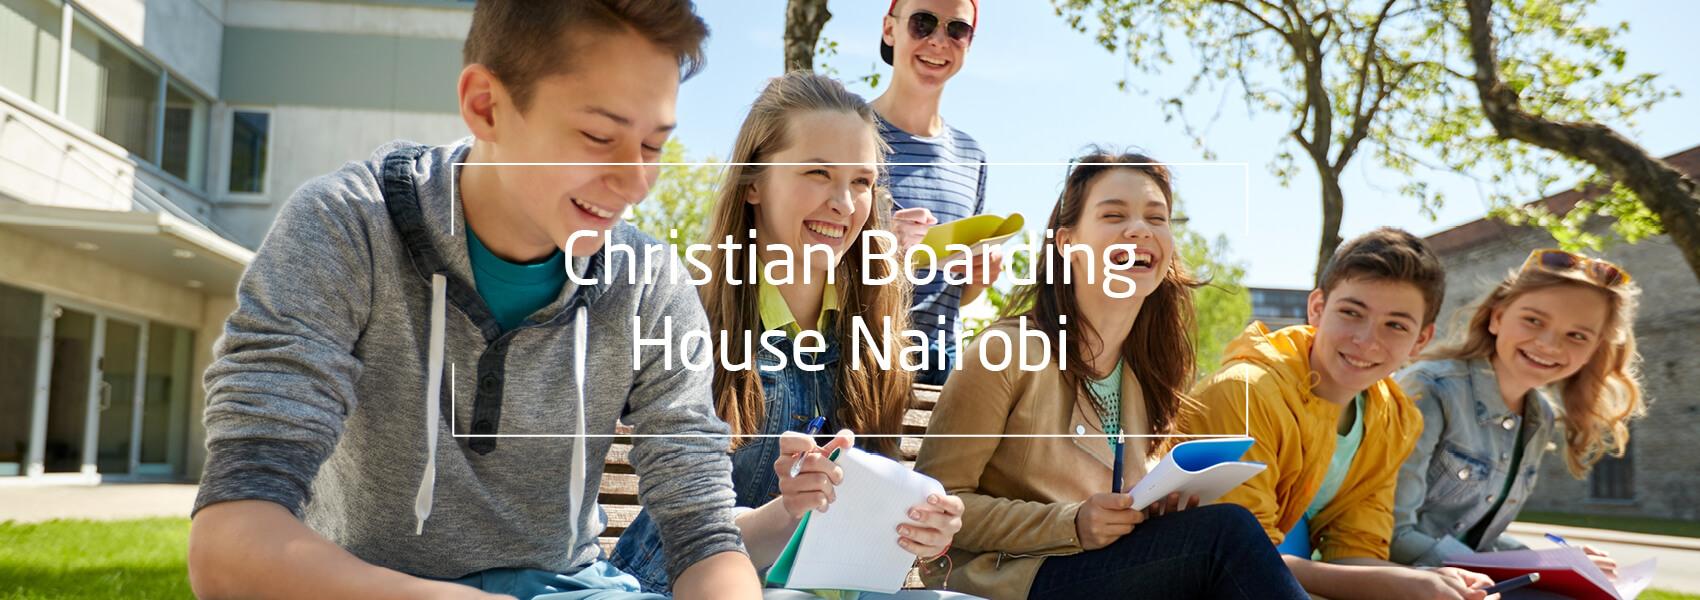 Jugendliche, Text: Christian Boarding House Nairobi